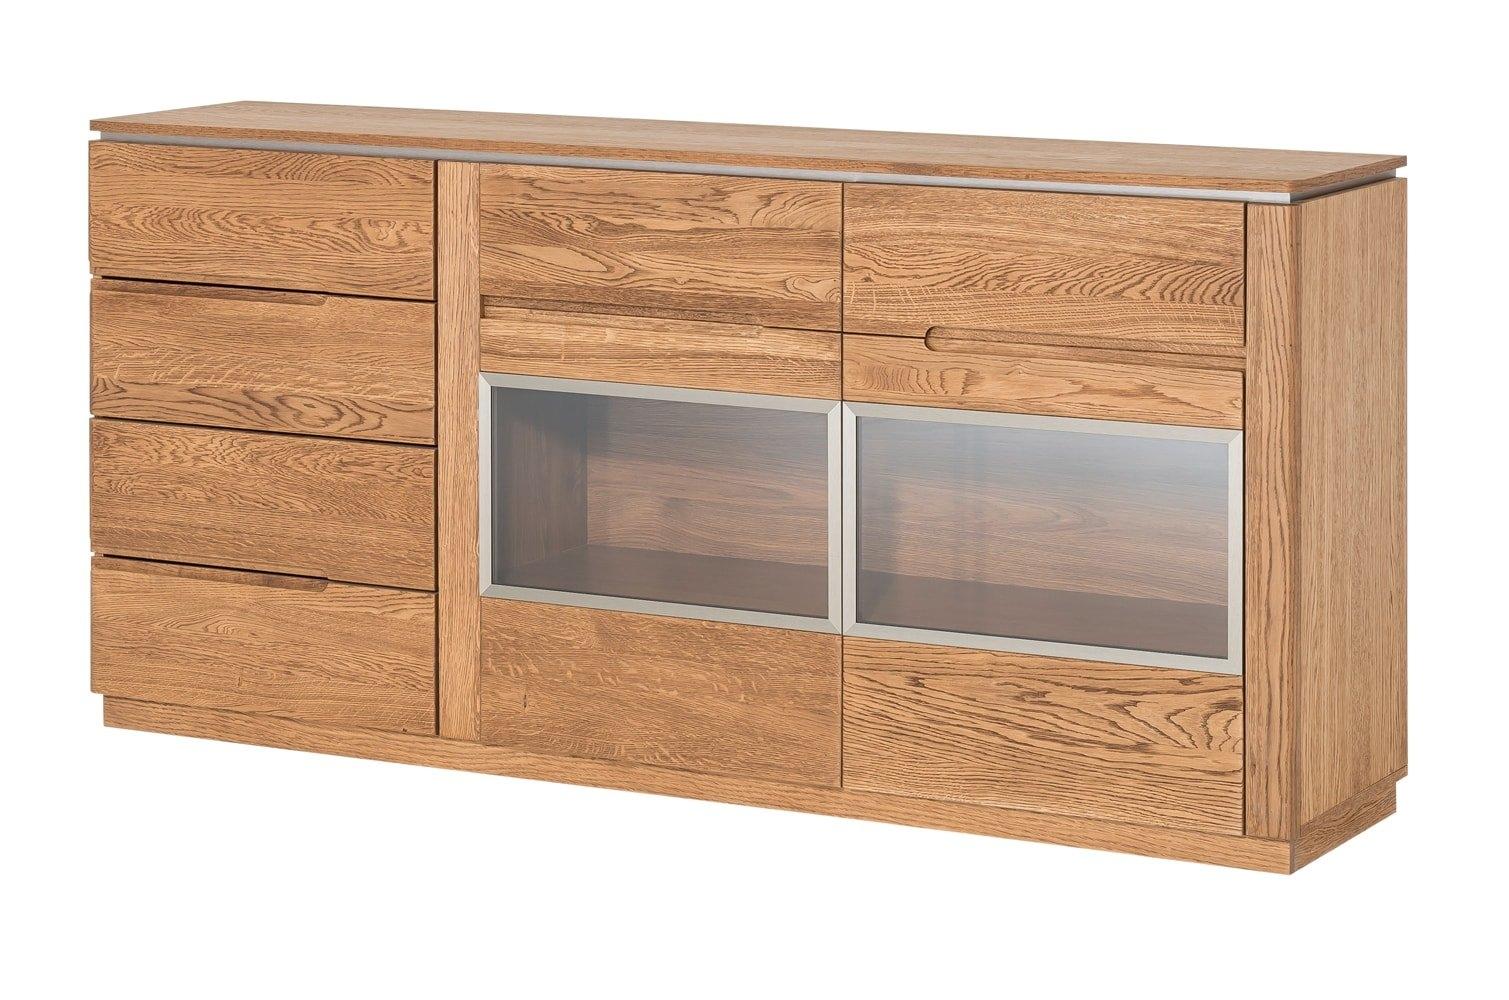 Comoda cu vitrina din lemn si furnir, 4 sertare si 2 usi Montenegro 47 Stejar Rustic, l180xA42xH87 cm poza